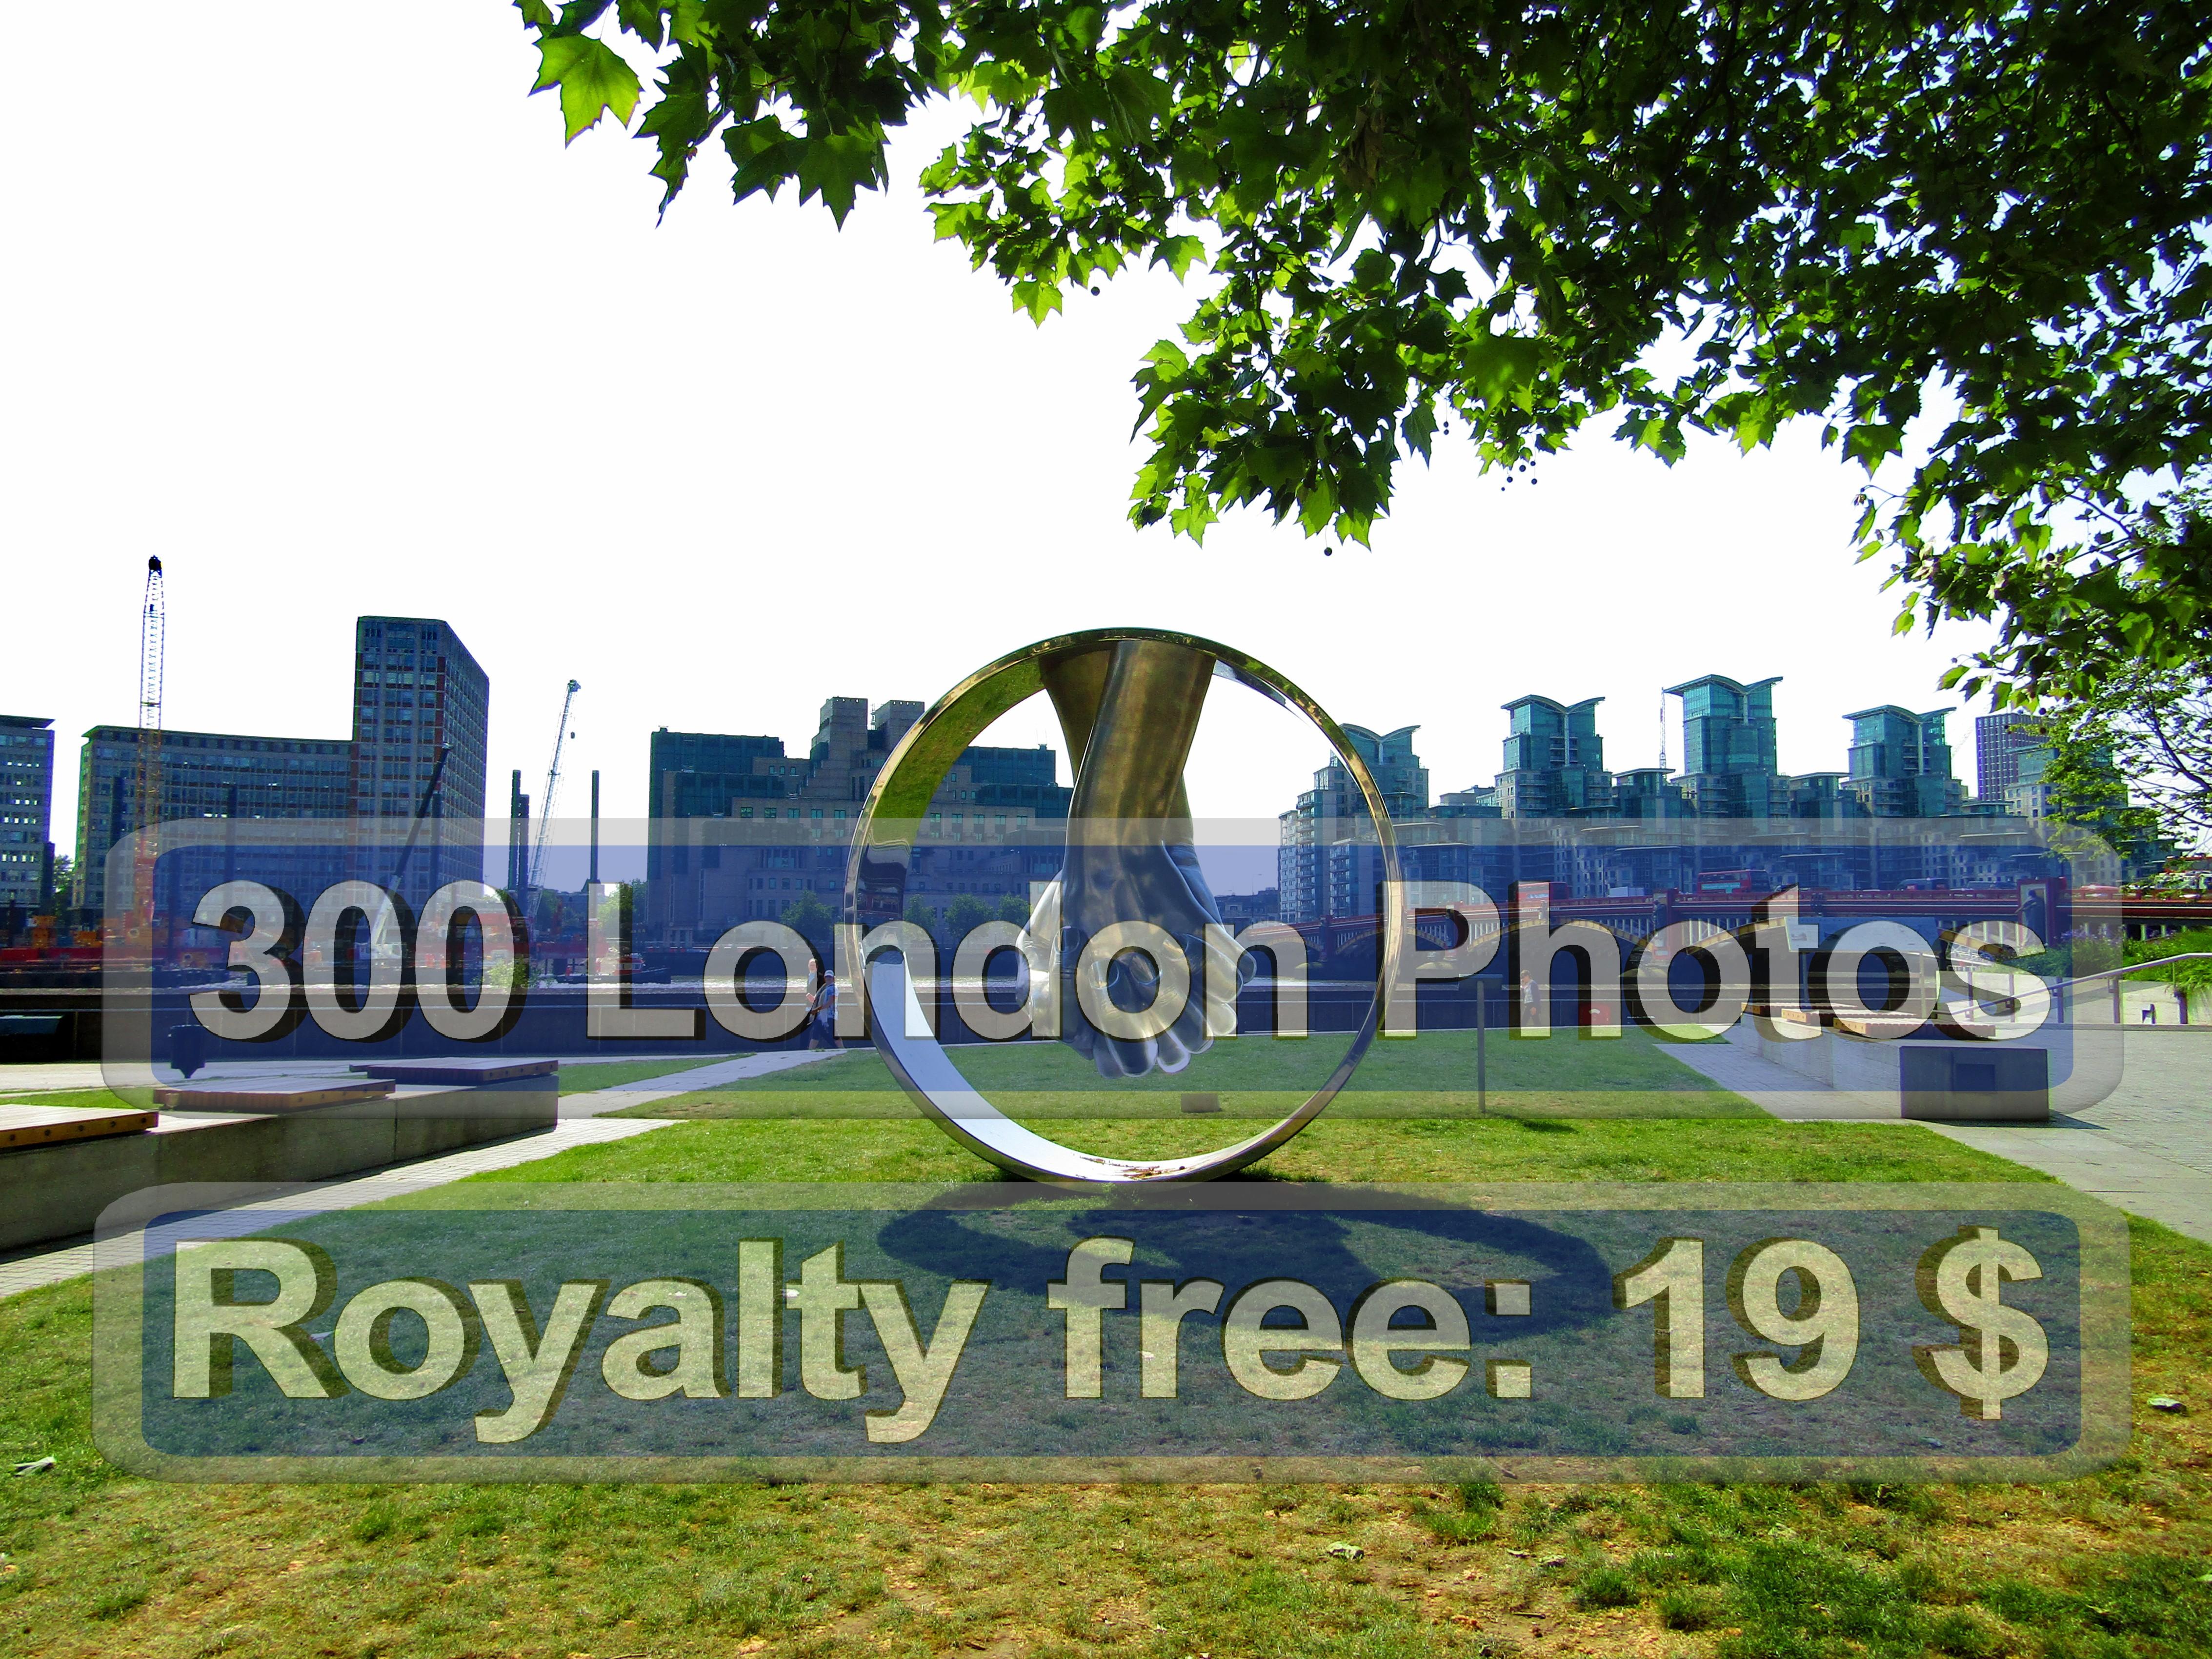 London Drugs Photo Print Quality